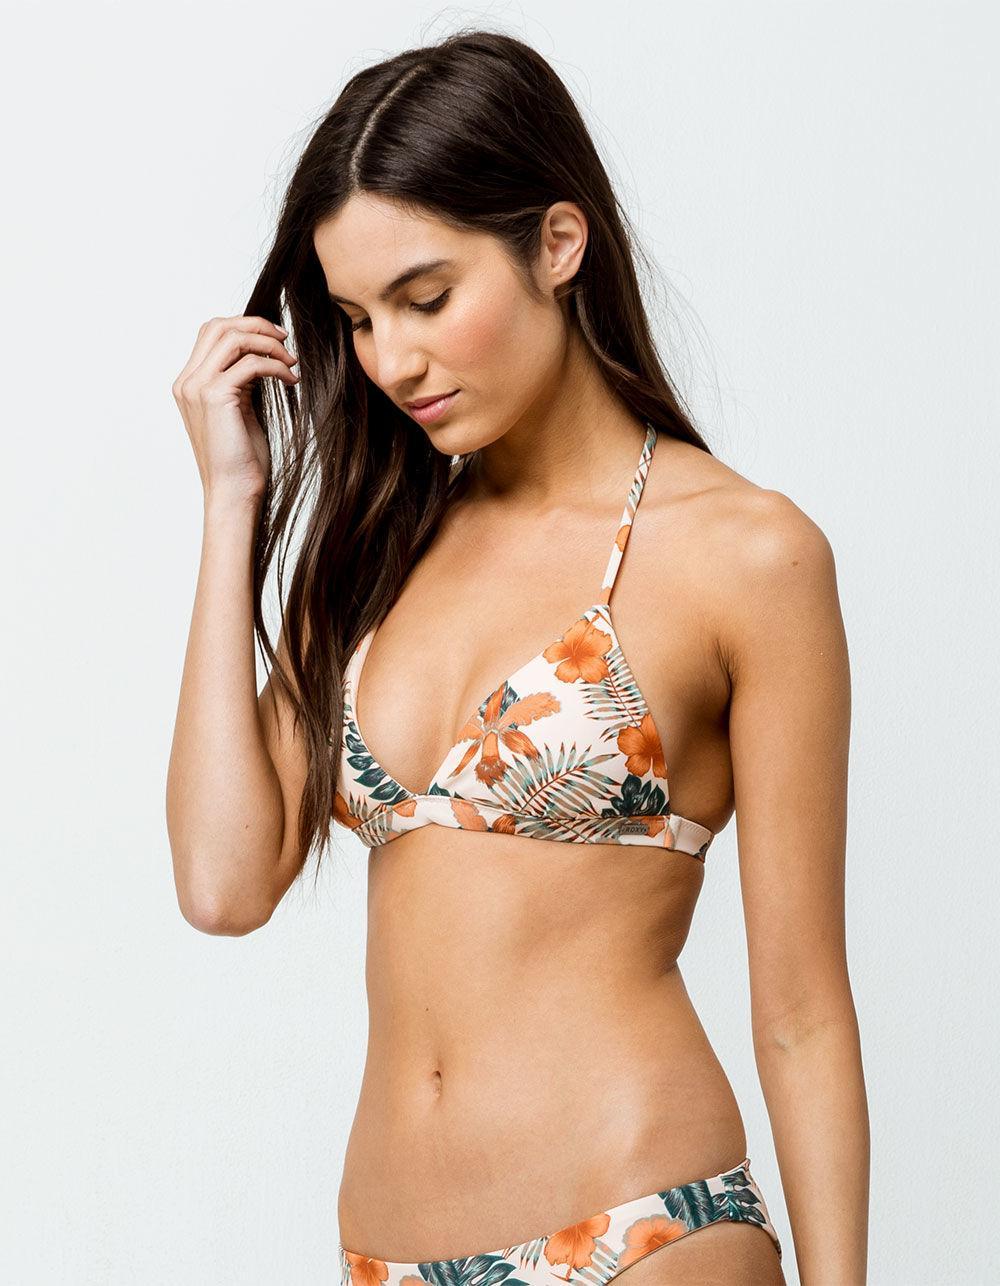 a4b1a9ee420 Roxy. Women's Printed Strappy Love Reversible Triangle Bikini Top